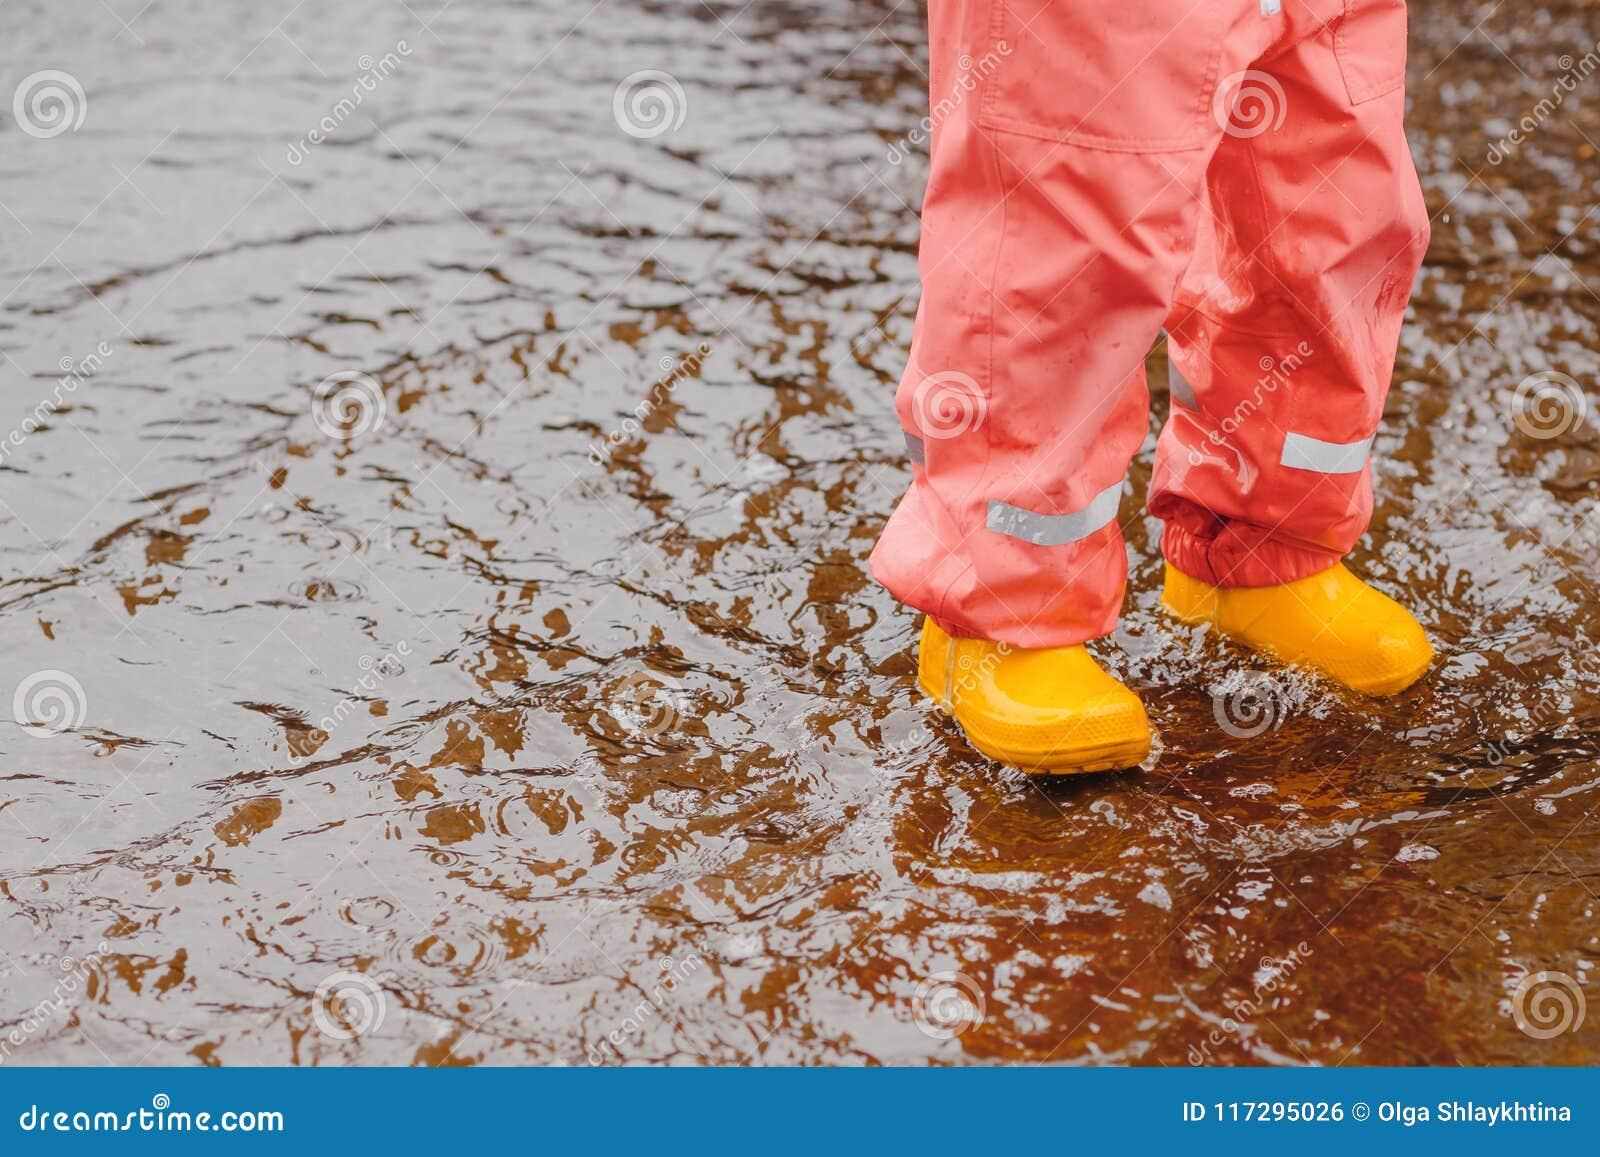 Umbrella red summer yellow boots girl toddler